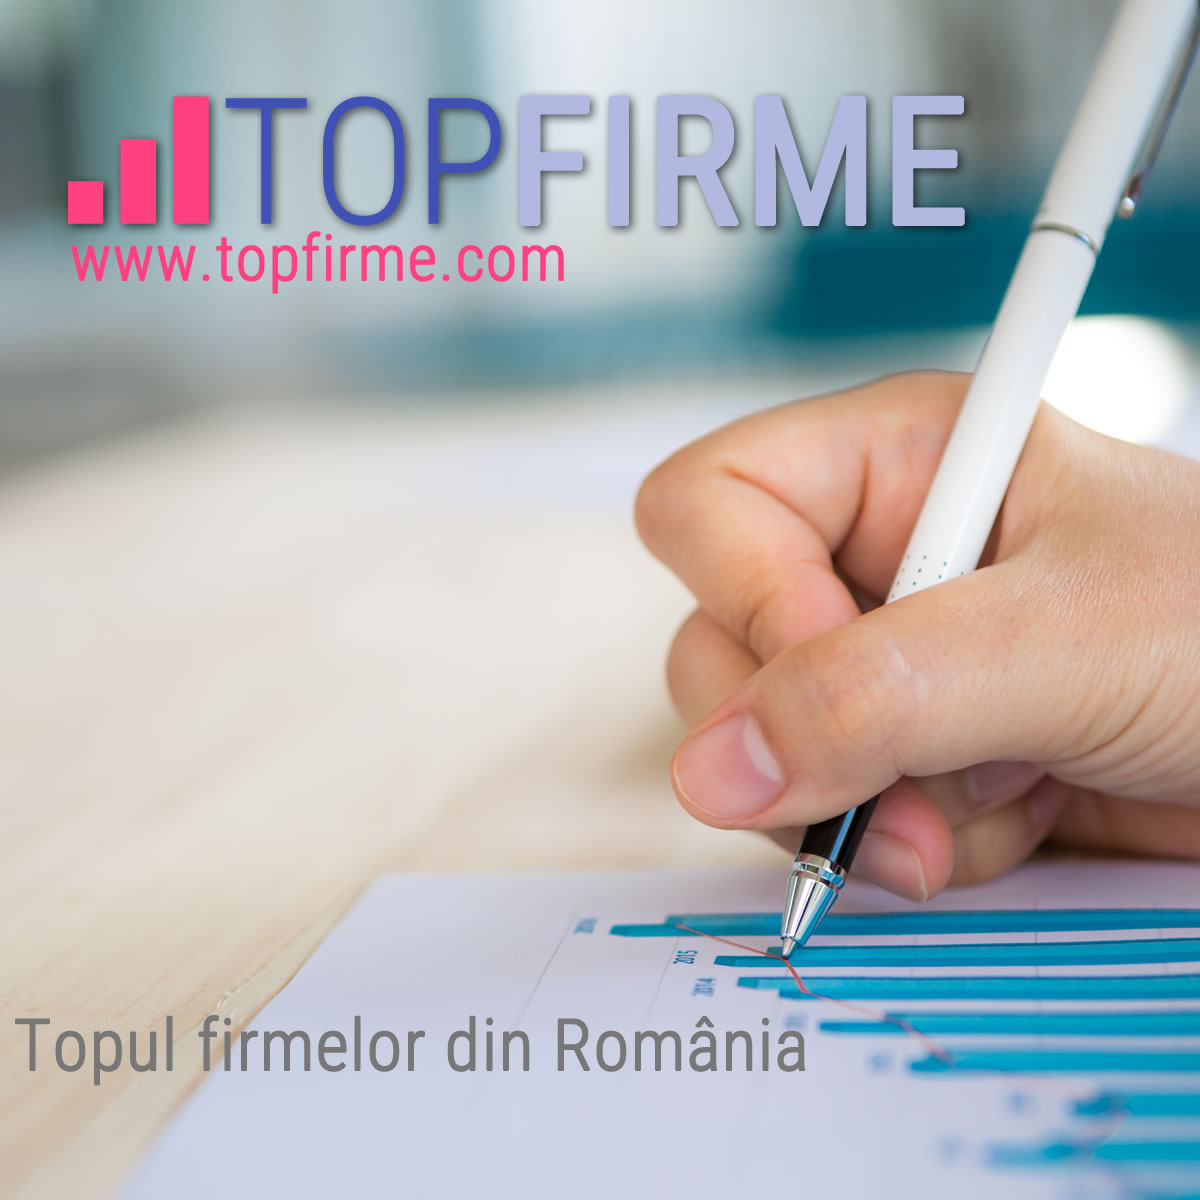 www.topfirme.com